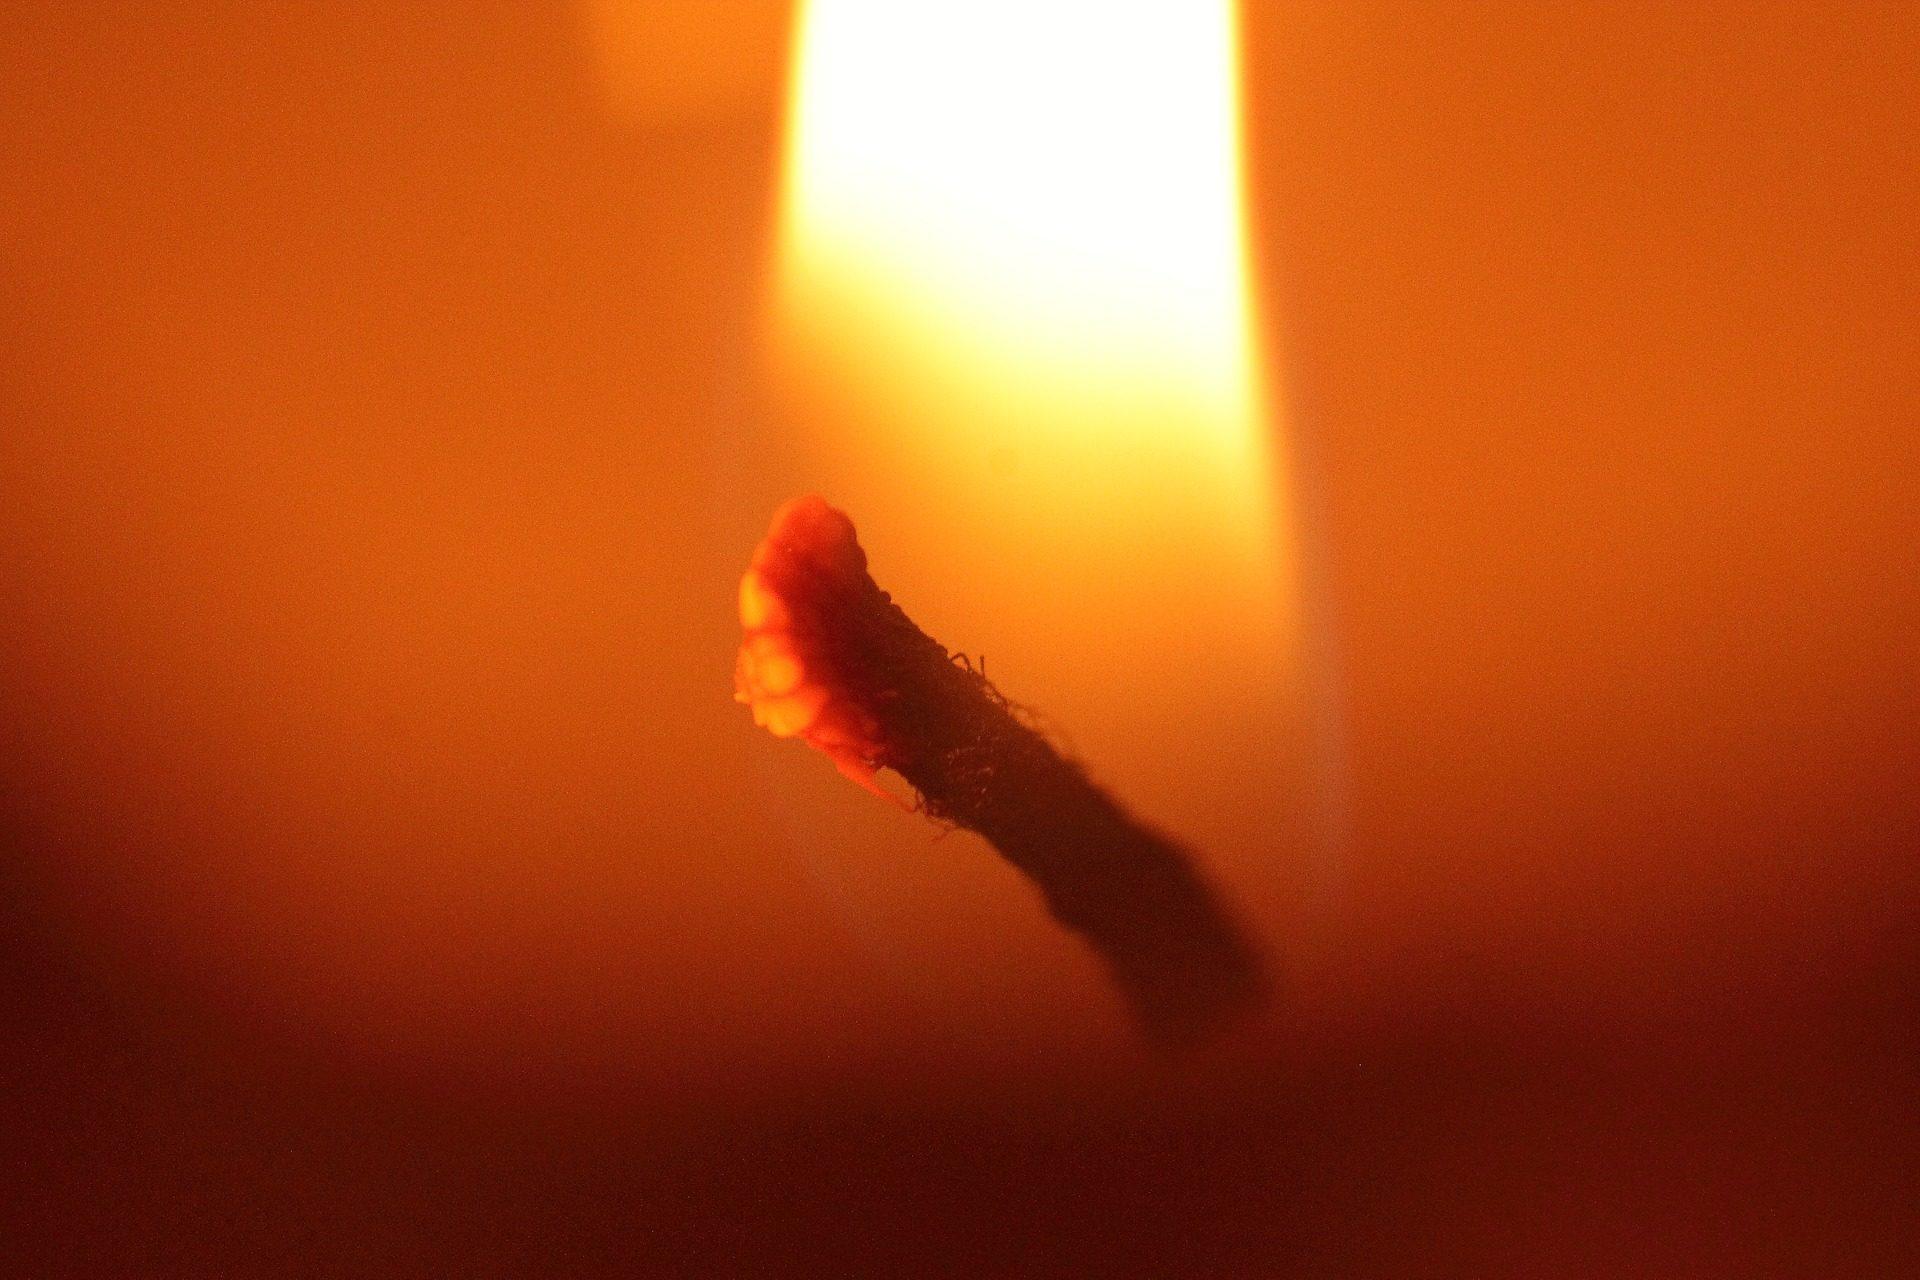 flamme, bougie, feu, Mèche, lumière, chaleur - Fonds d'écran HD - Professor-falken.com